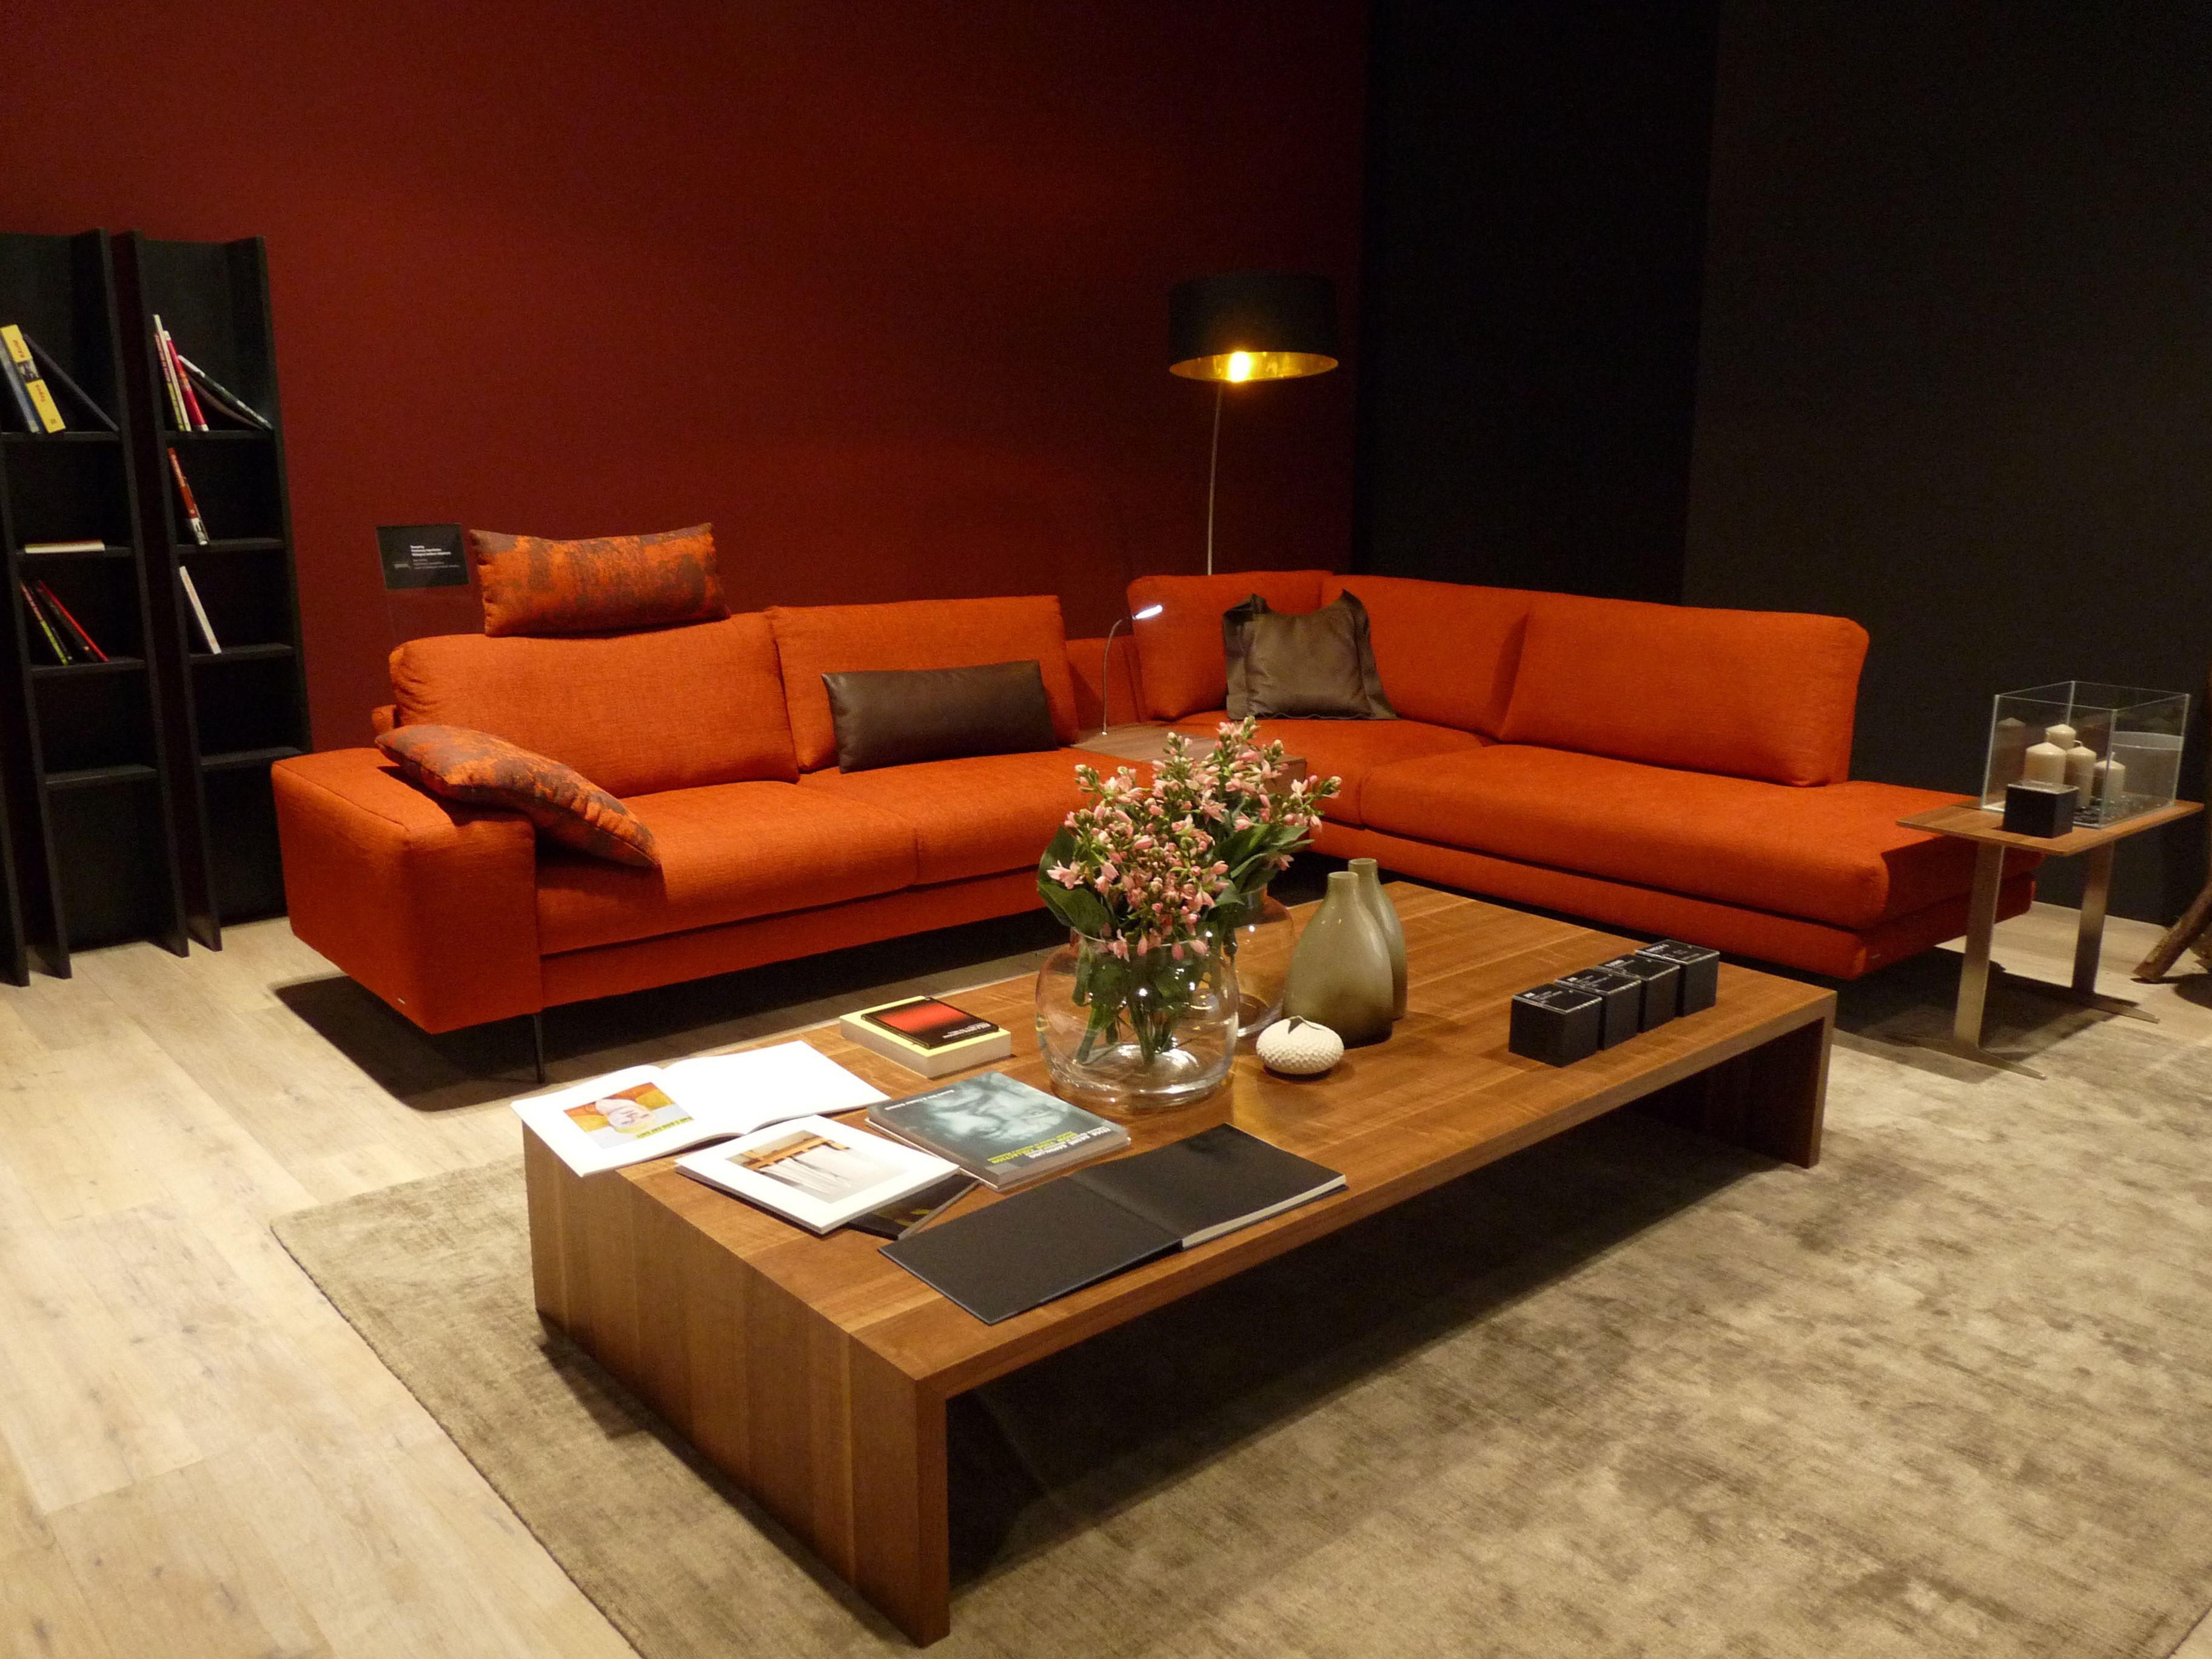 Koinor imm cologne 2014 Sofa und Sessel